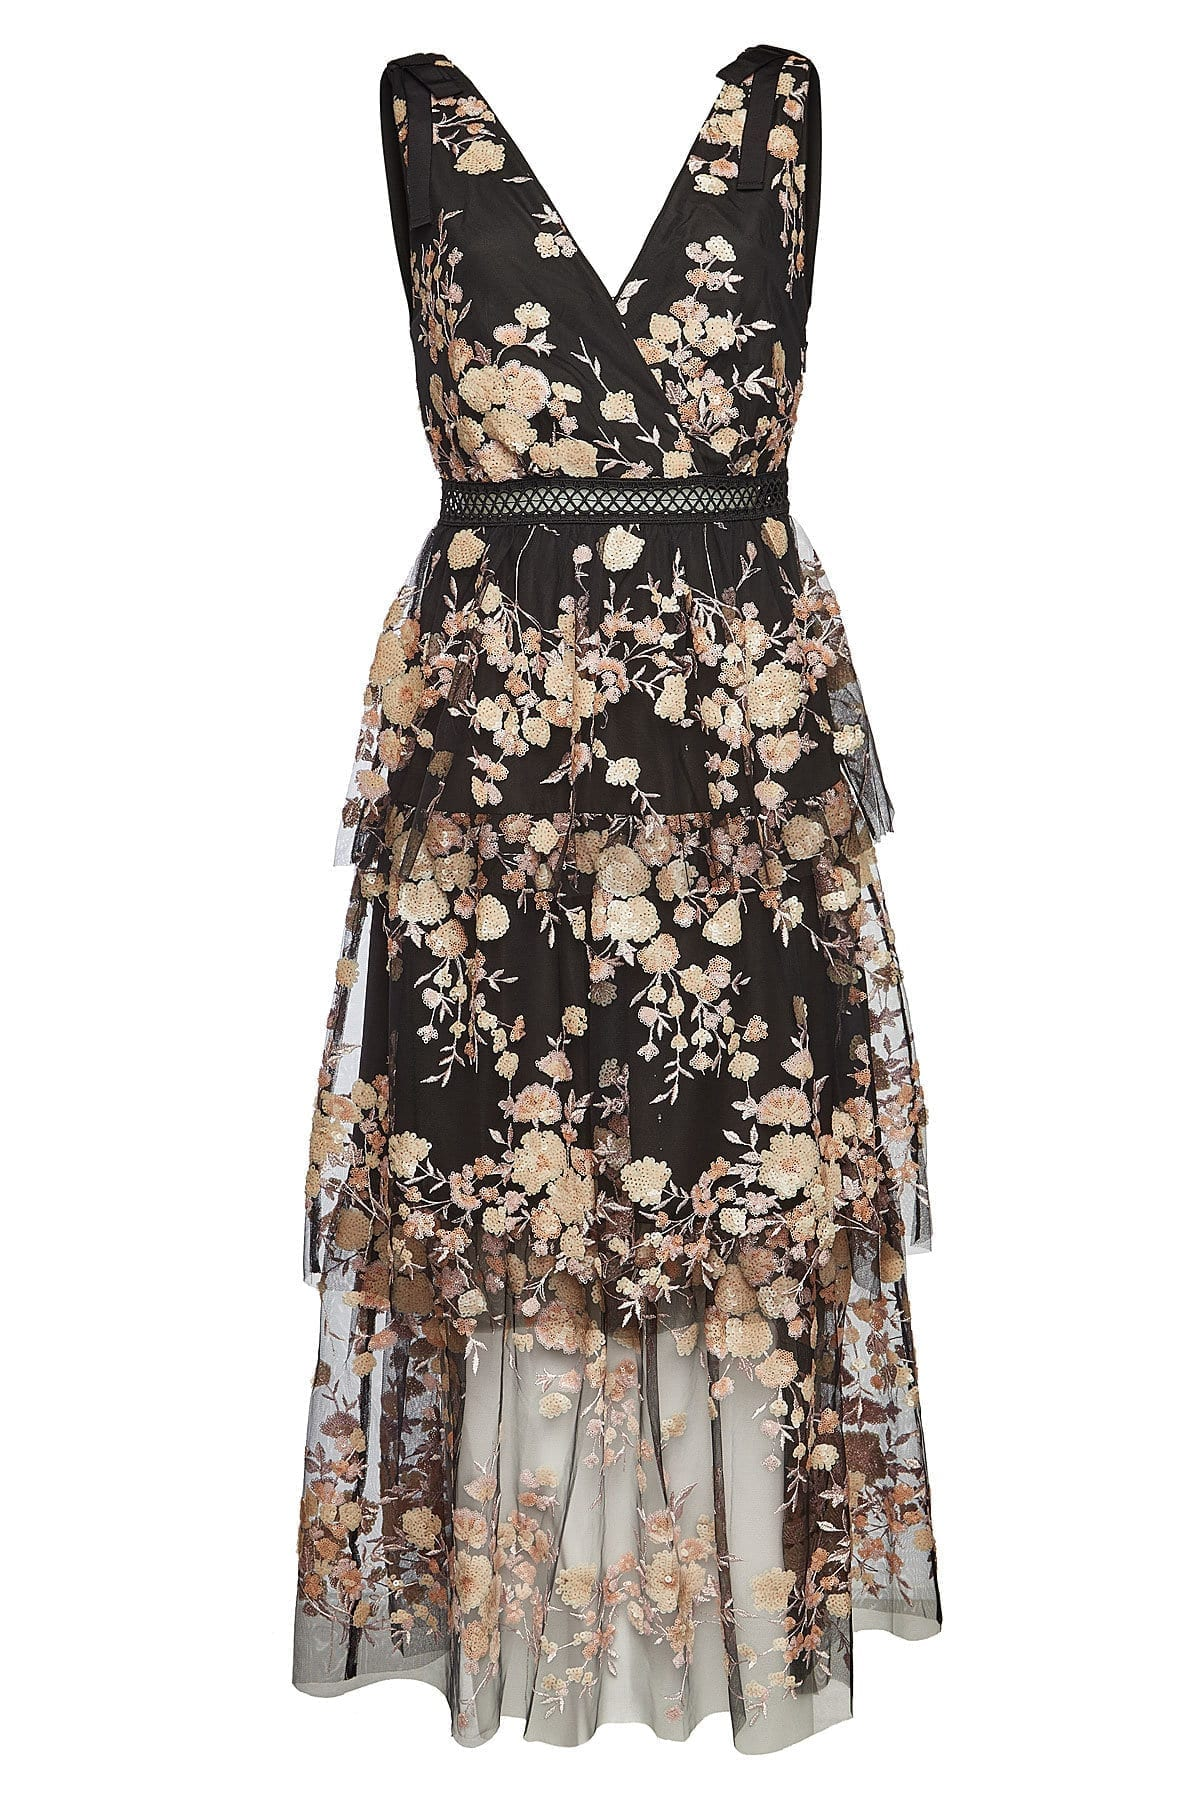 SELF-PORTRAIT Sequins and Mesh Sleeveless Midi Black Dress